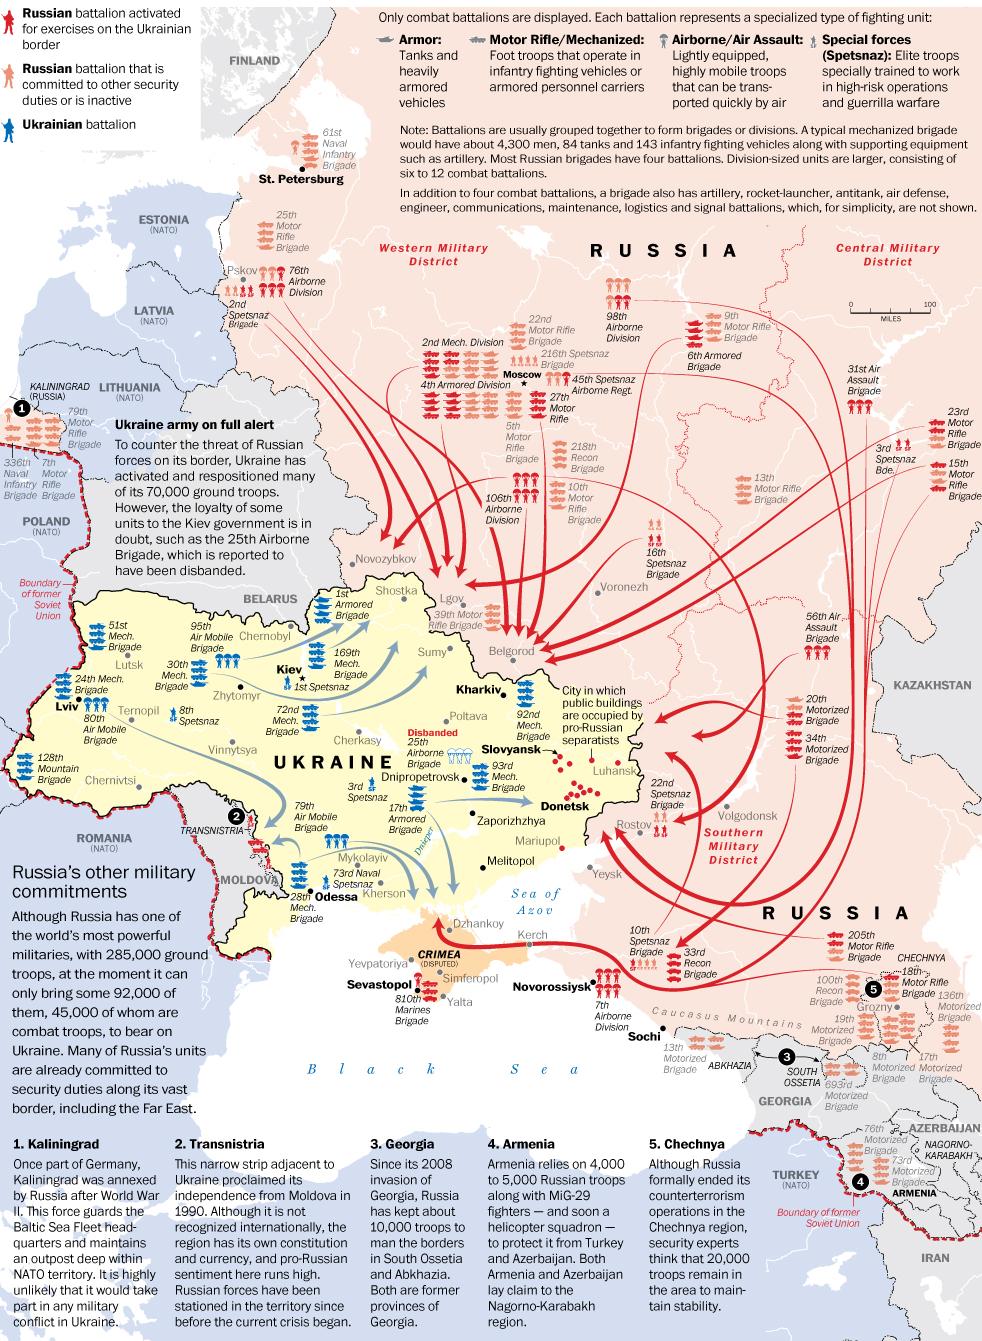 http://hieuminh.files.wordpress.com/2014/05/ukraine-rusiv5.jpg